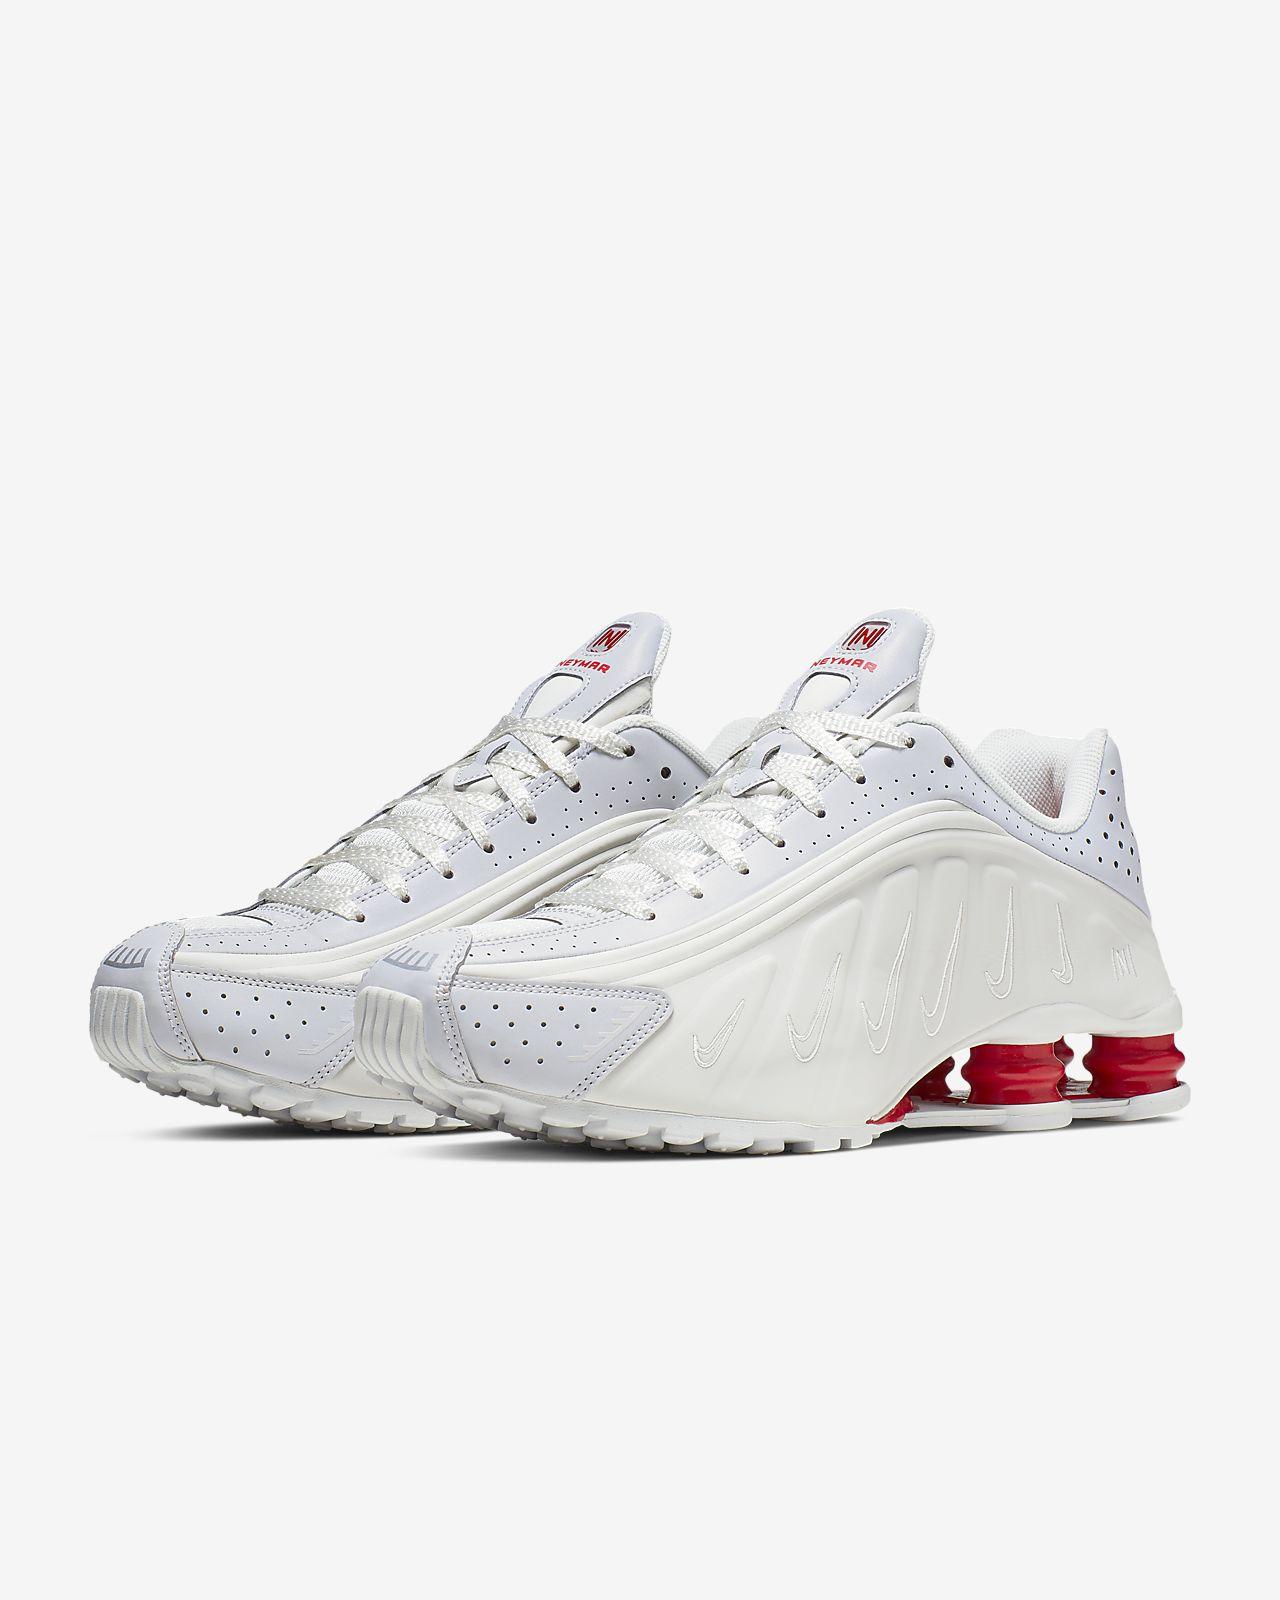 Nike Shox R4 Nike News